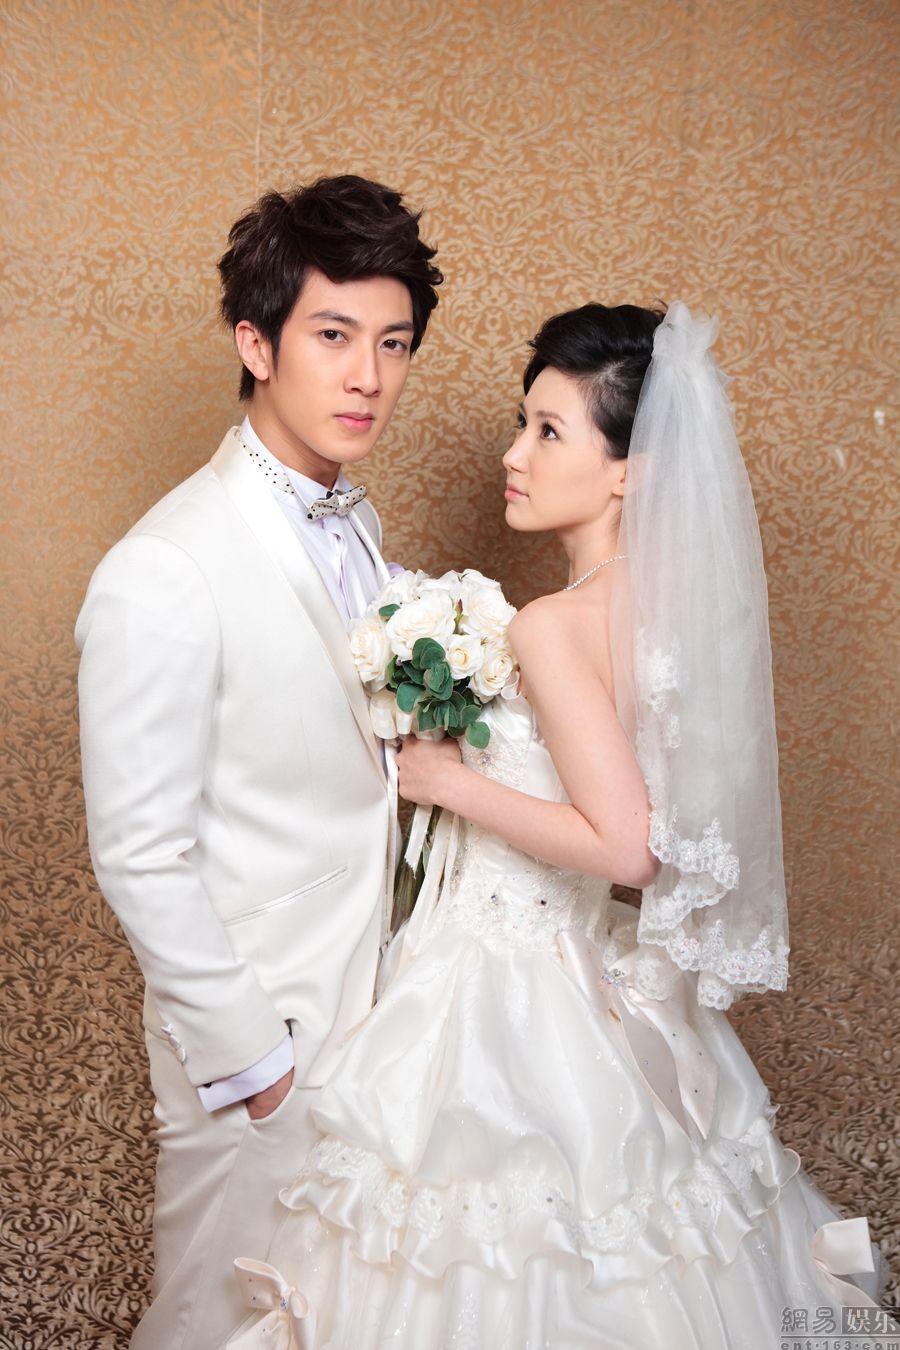 Wu zun and ella dating 2